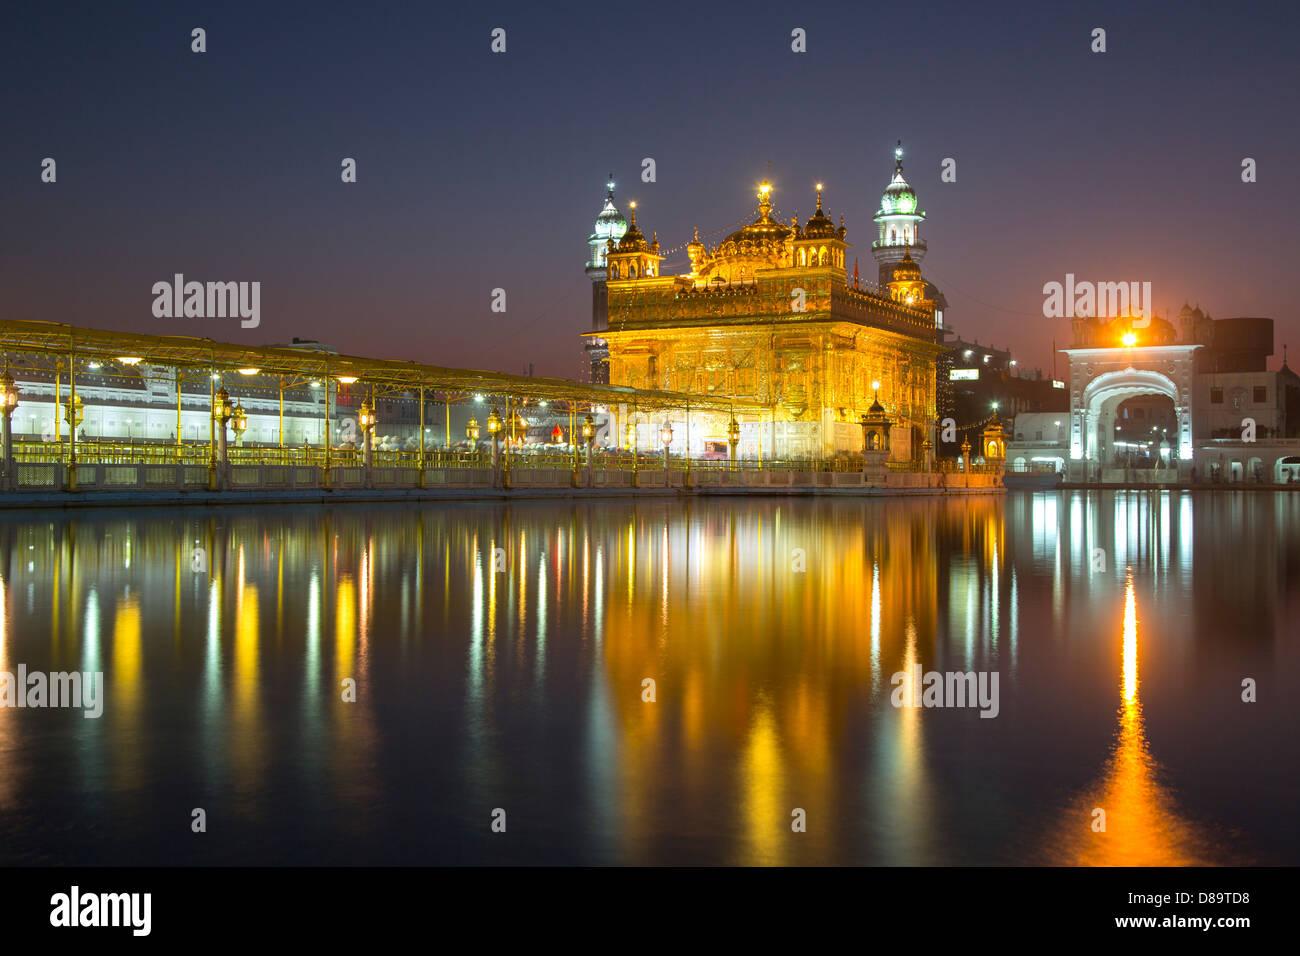 golden temple amritsar night stock photos & golden temple amritsar